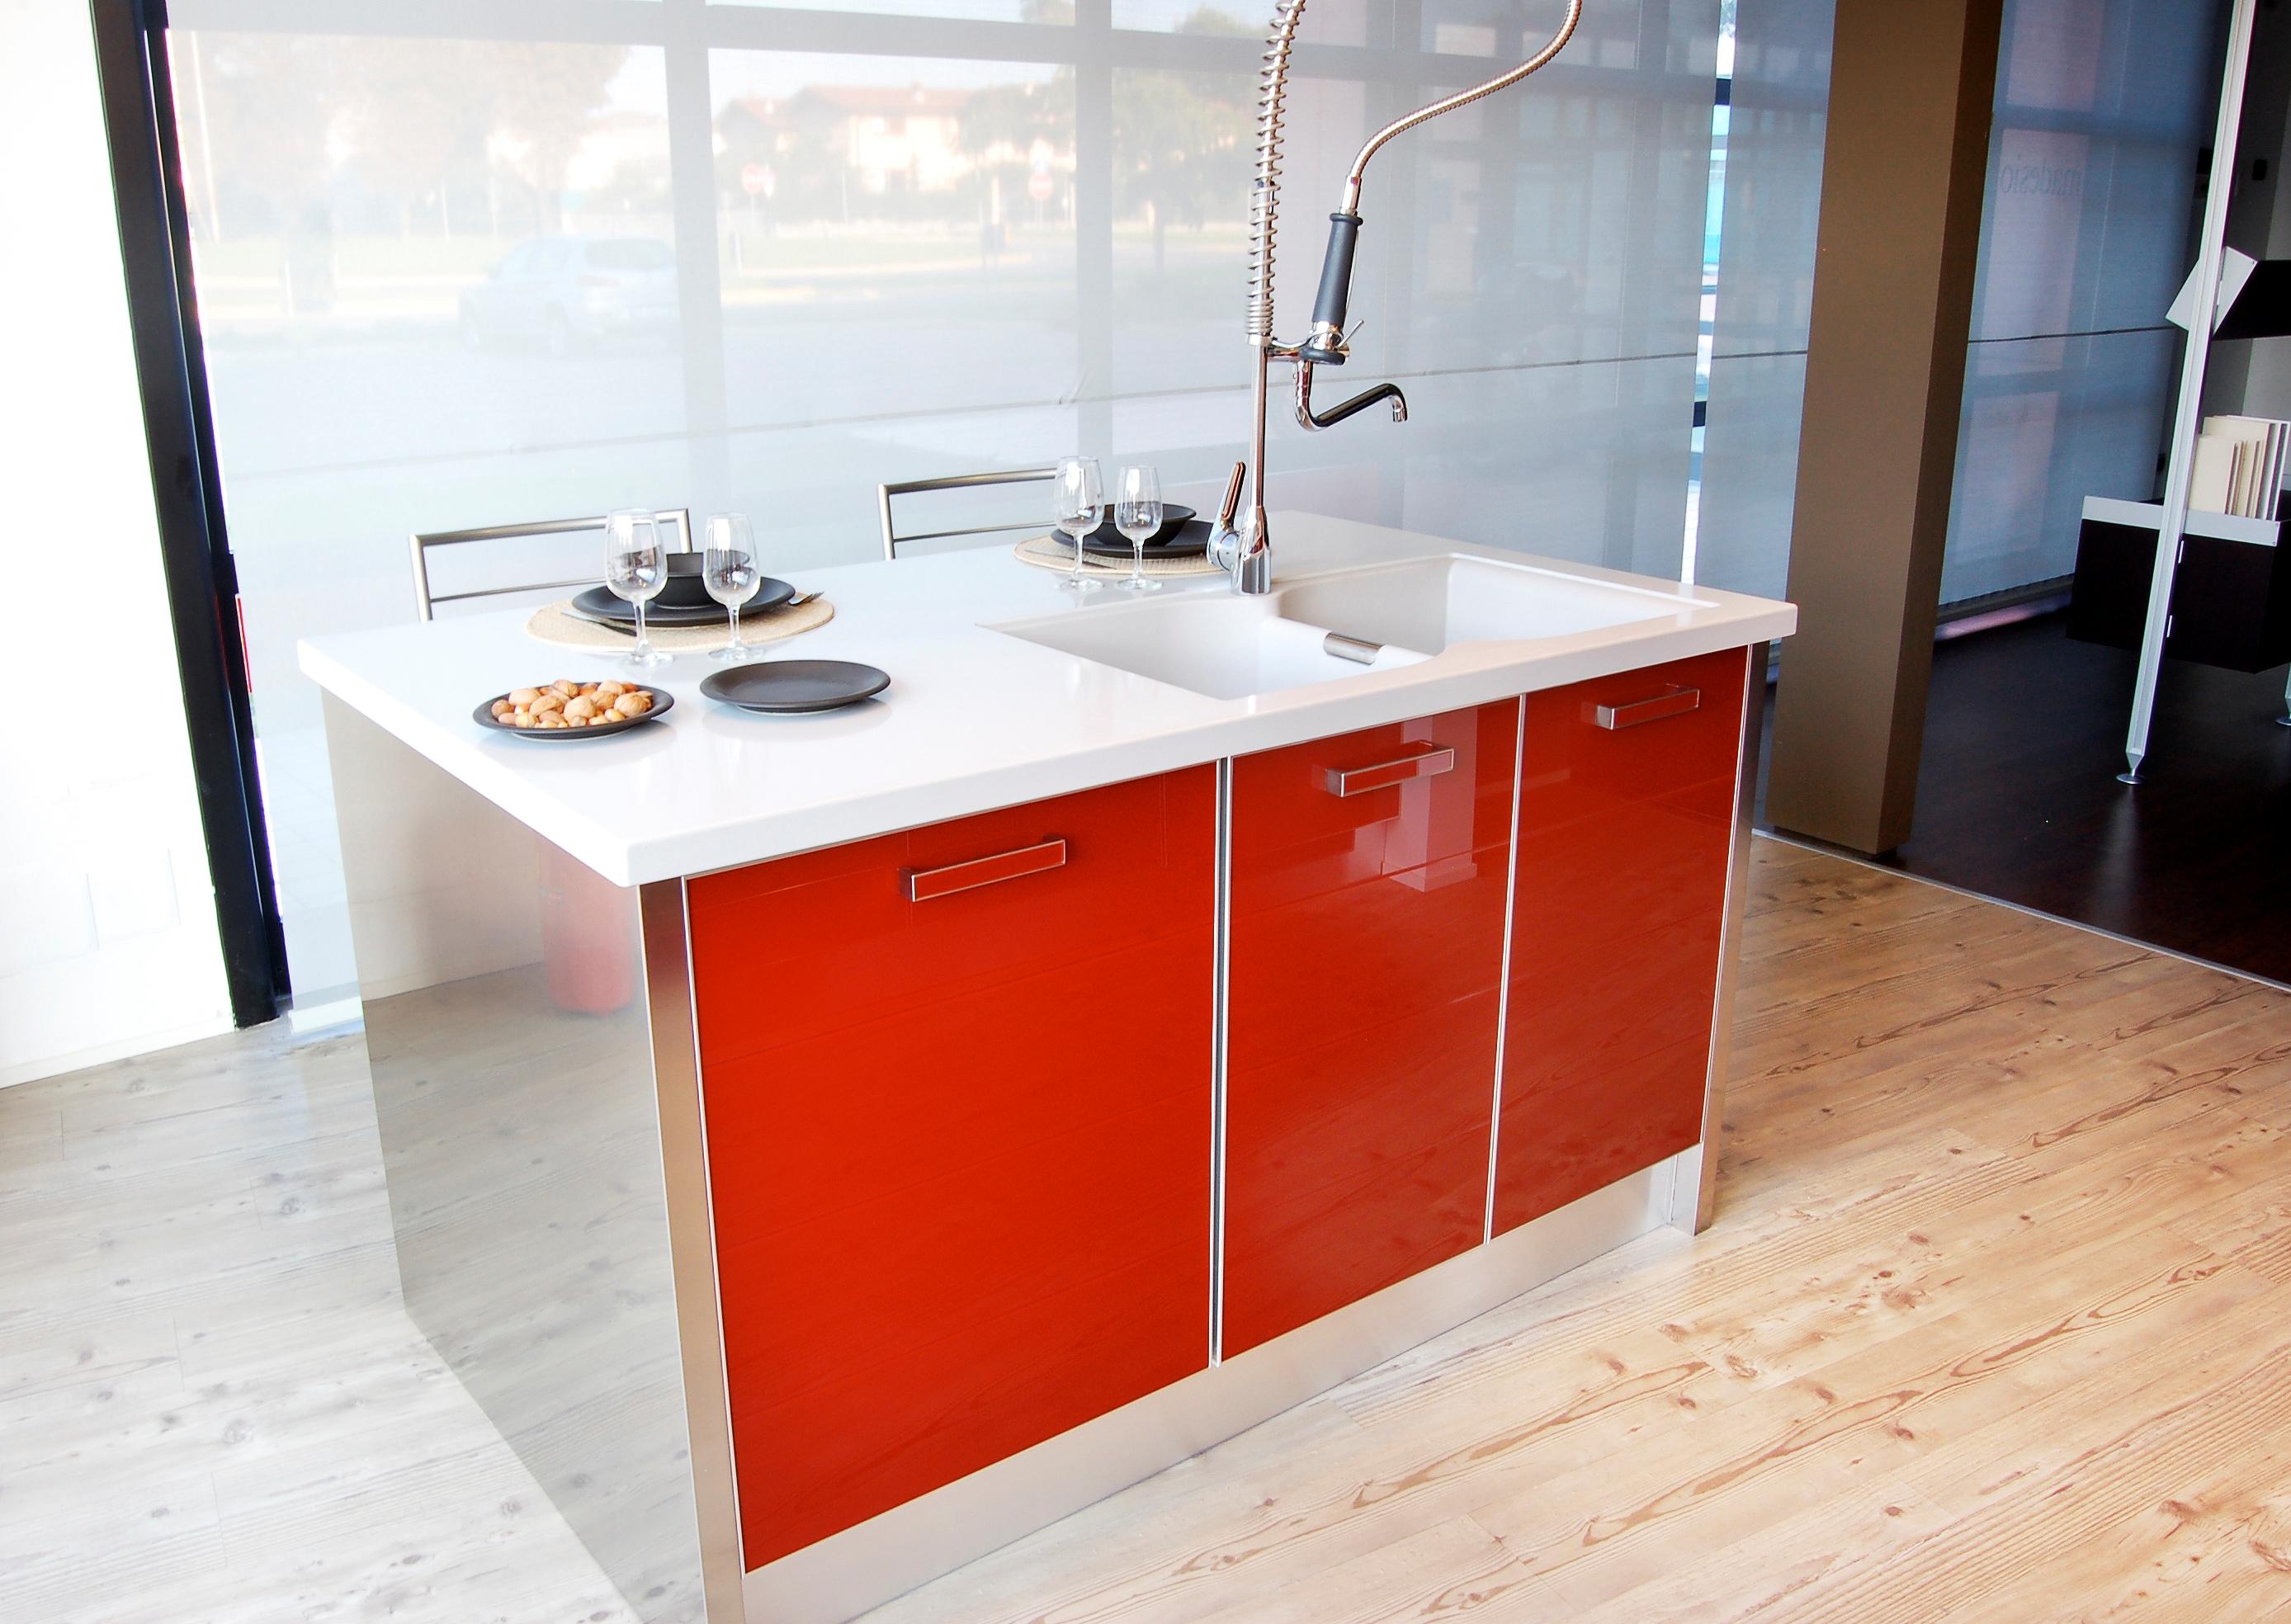 Cucina Scavolini Crystal Moderna Vetro - Cucine a prezzi scontati